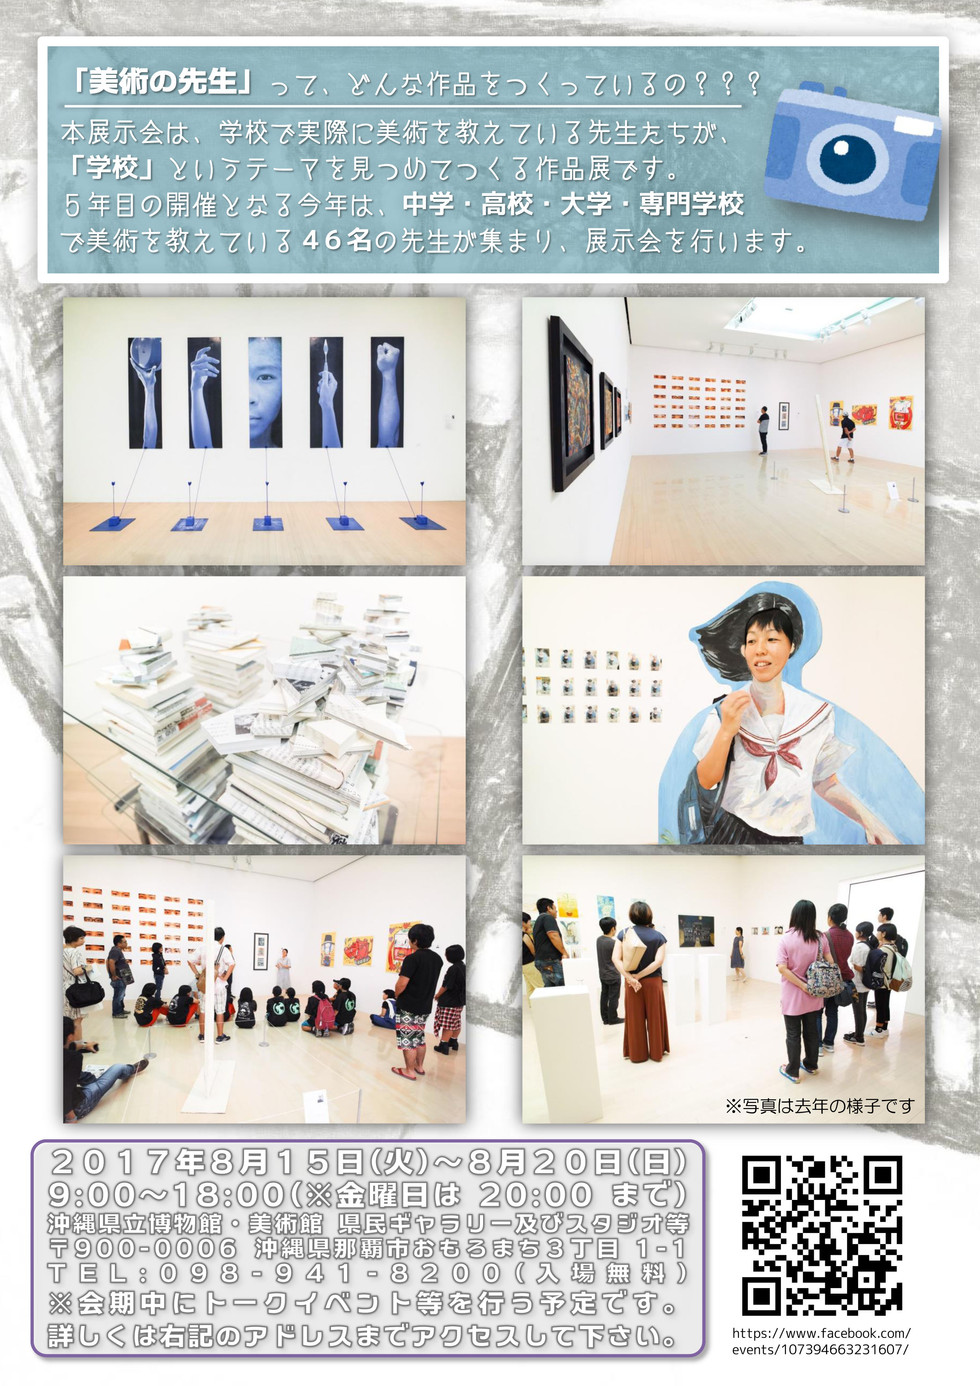 H29 美術の先生がつくった作品展-裏.jpg